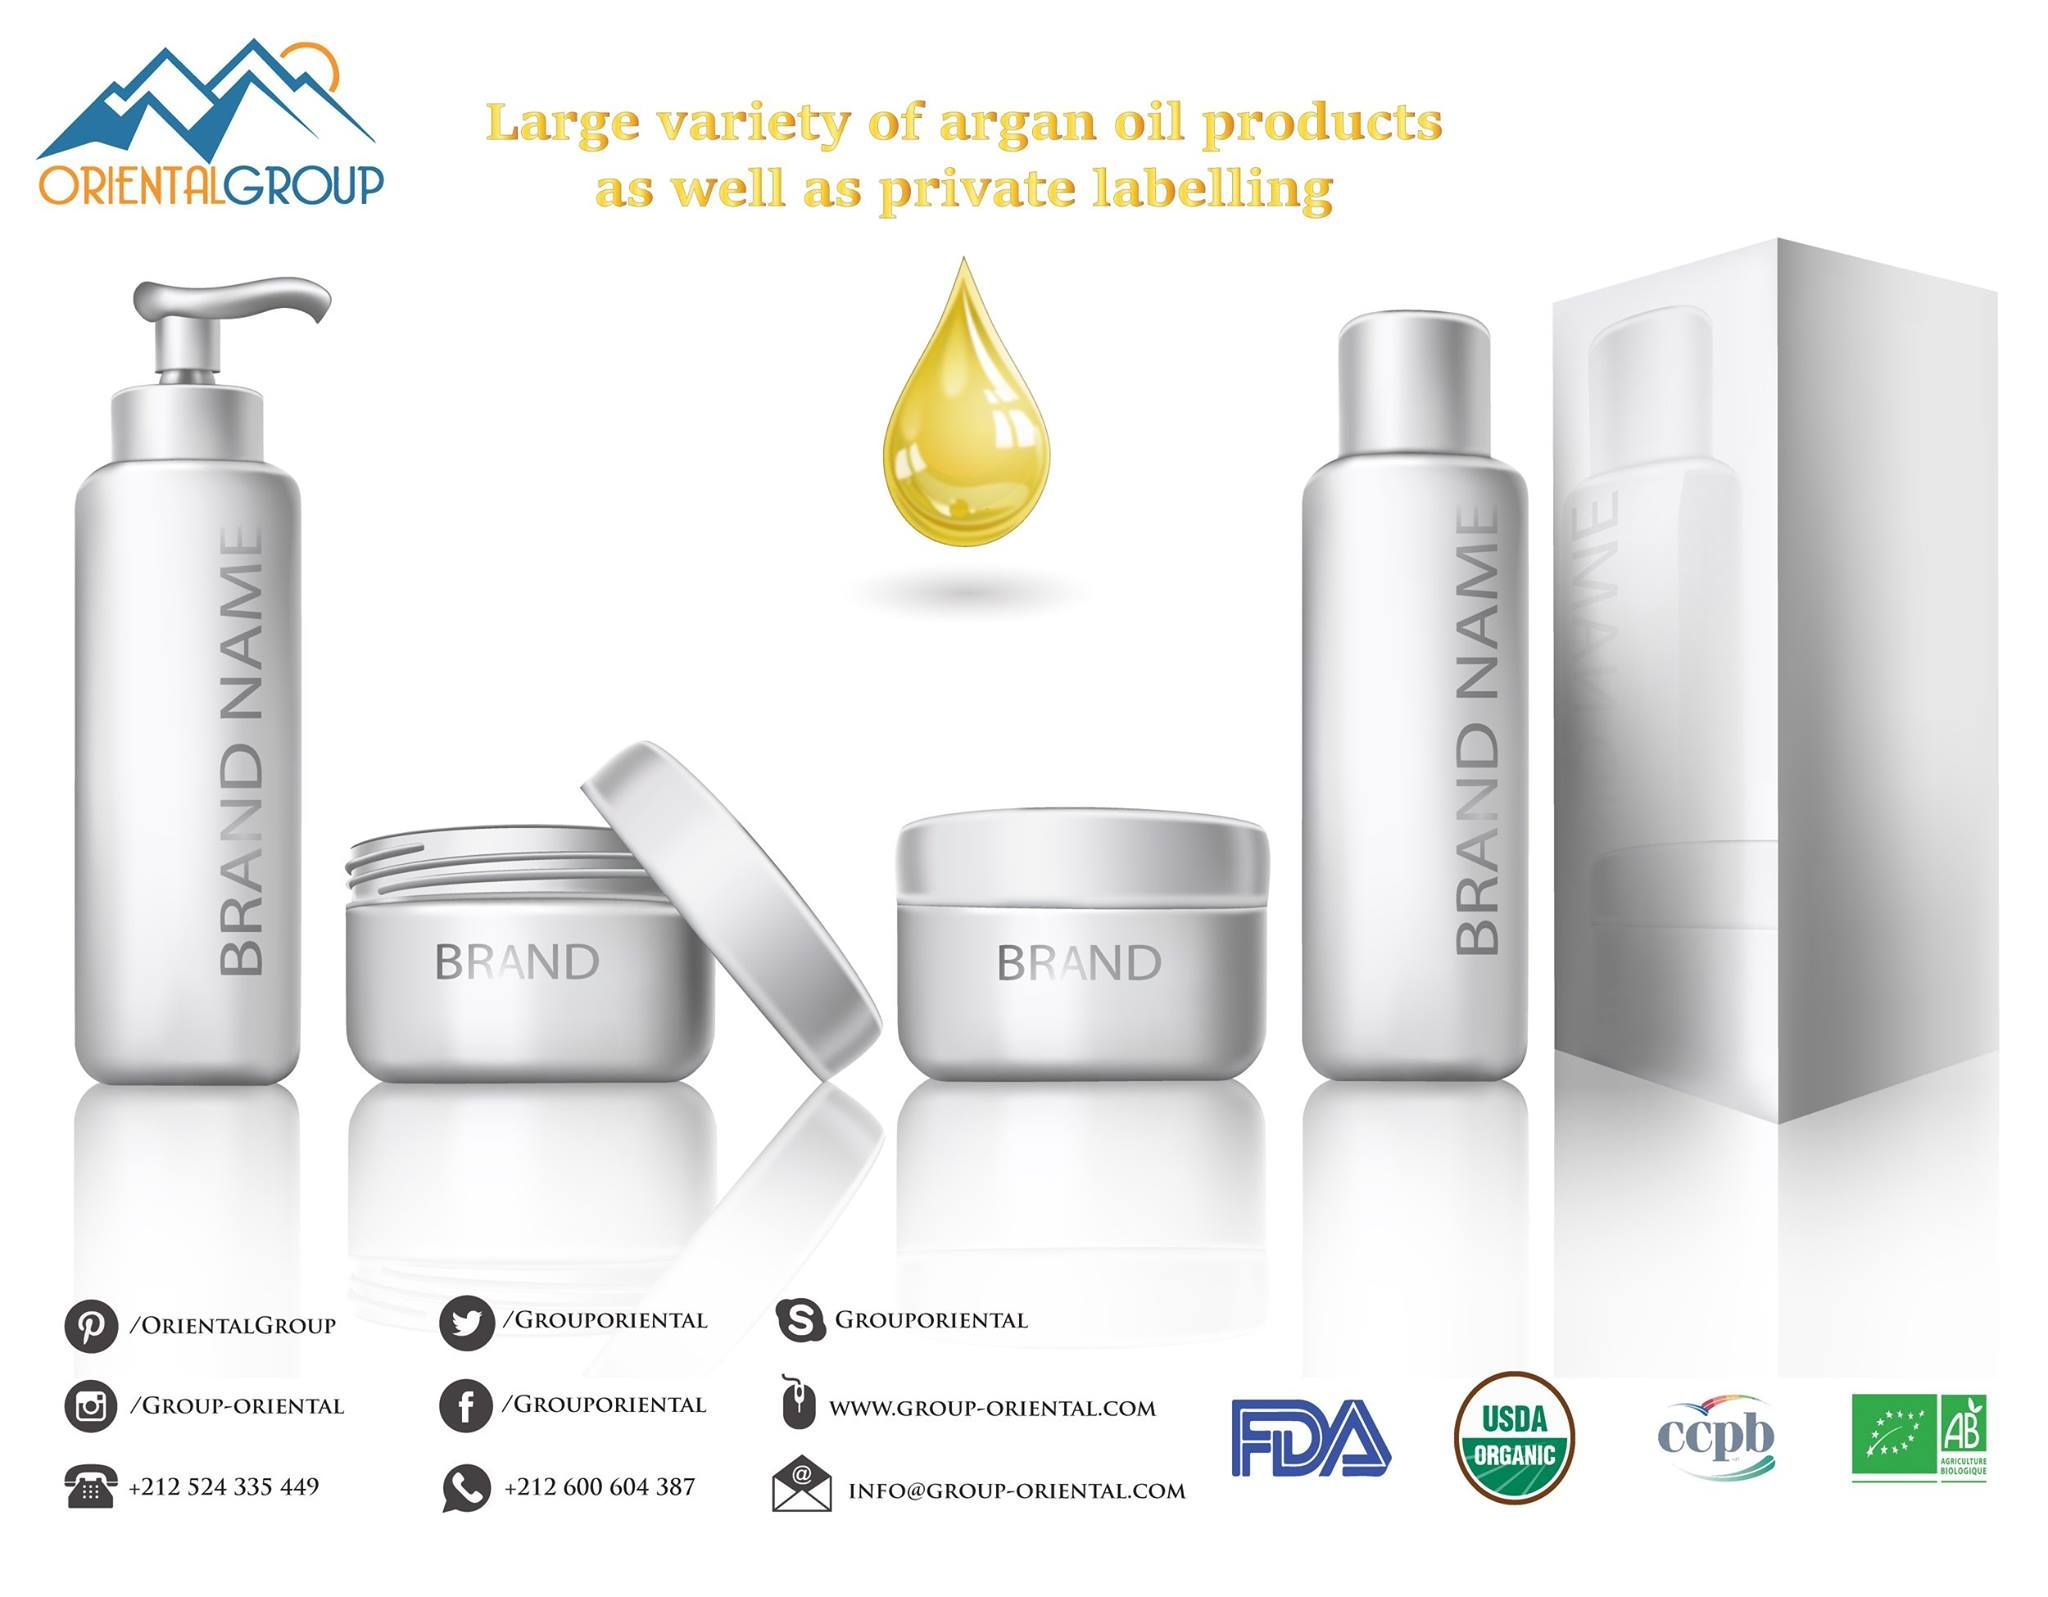 Private Label Wholesale Of Pure Argan Oil Is Our Main Business Argan Arganoil Huile Beauty Organic Bi Argan Oil Pure Argan Oil Private Label Cosmetics